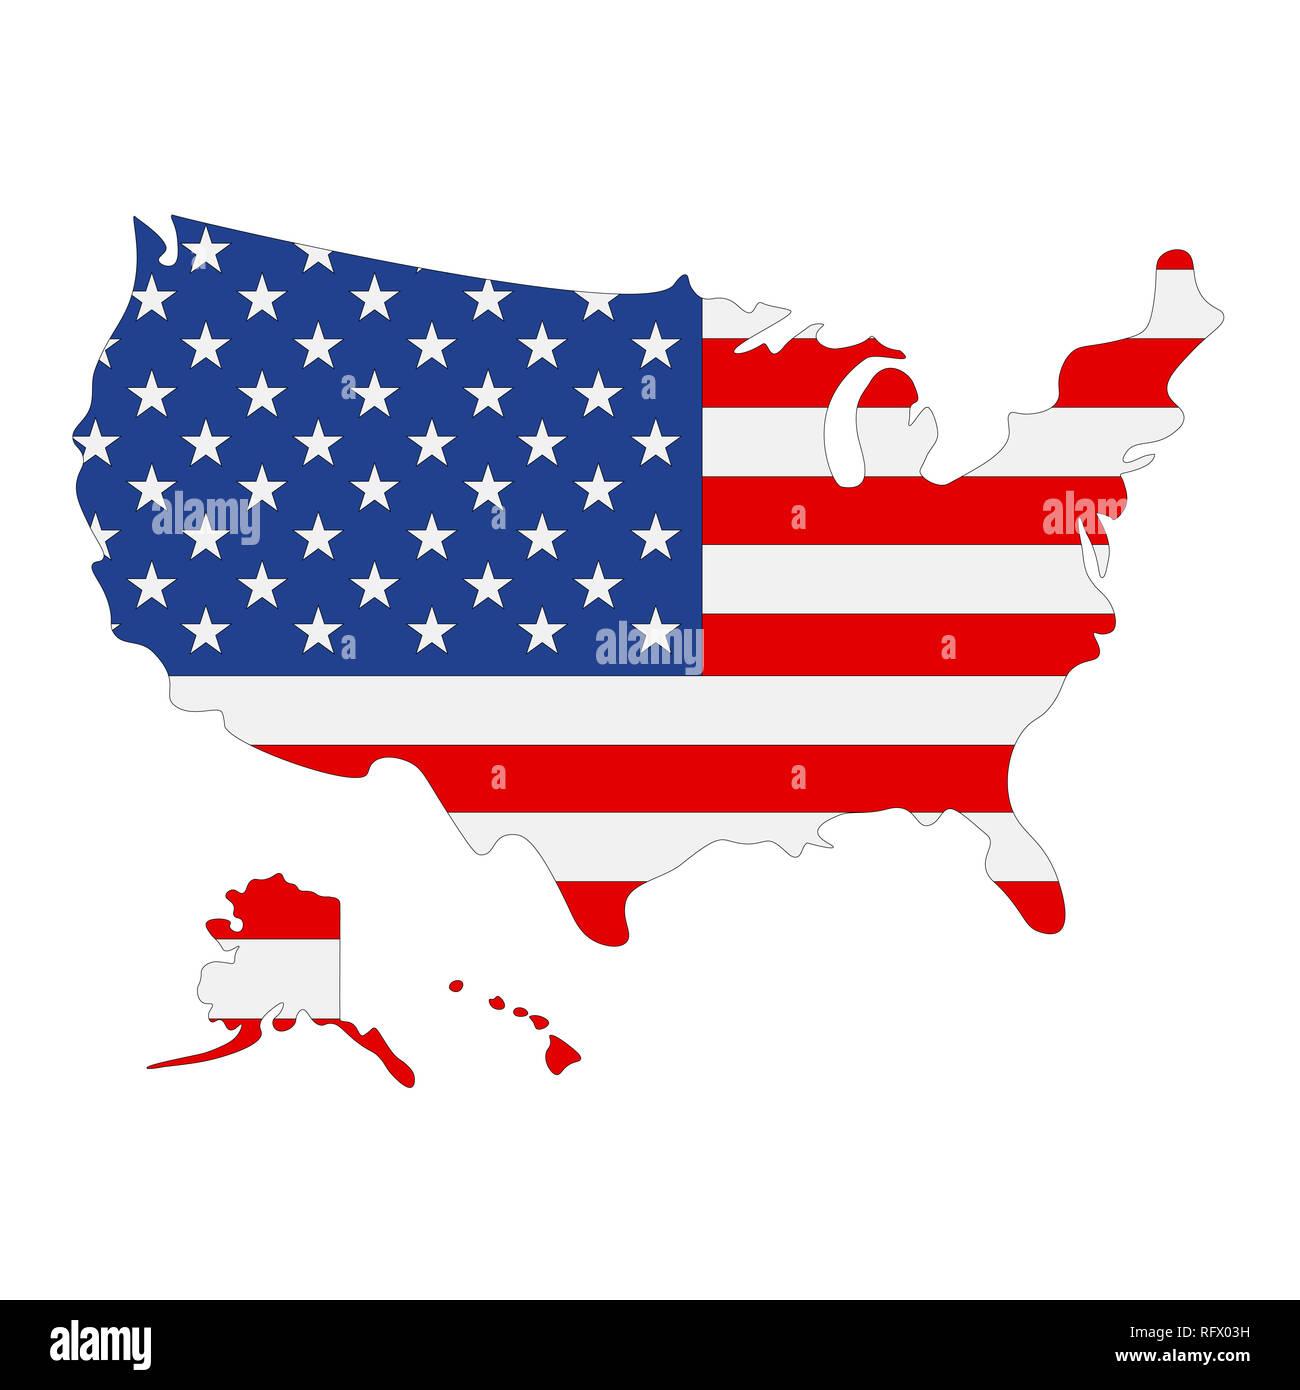 map of USA with flag inside. United States of America map ... Map It Usa on usa rivers, usa ma, usa landmarks, usa buildings, usa capitals, usa national parks, usa mountain ranges, usa outline, usa major cities, usa globe, usa climate, usa weather, usa geography, usa 13 colonies, usa mao, usa region, usa with states and cities, usa puzzle, usa food, usa and canada,